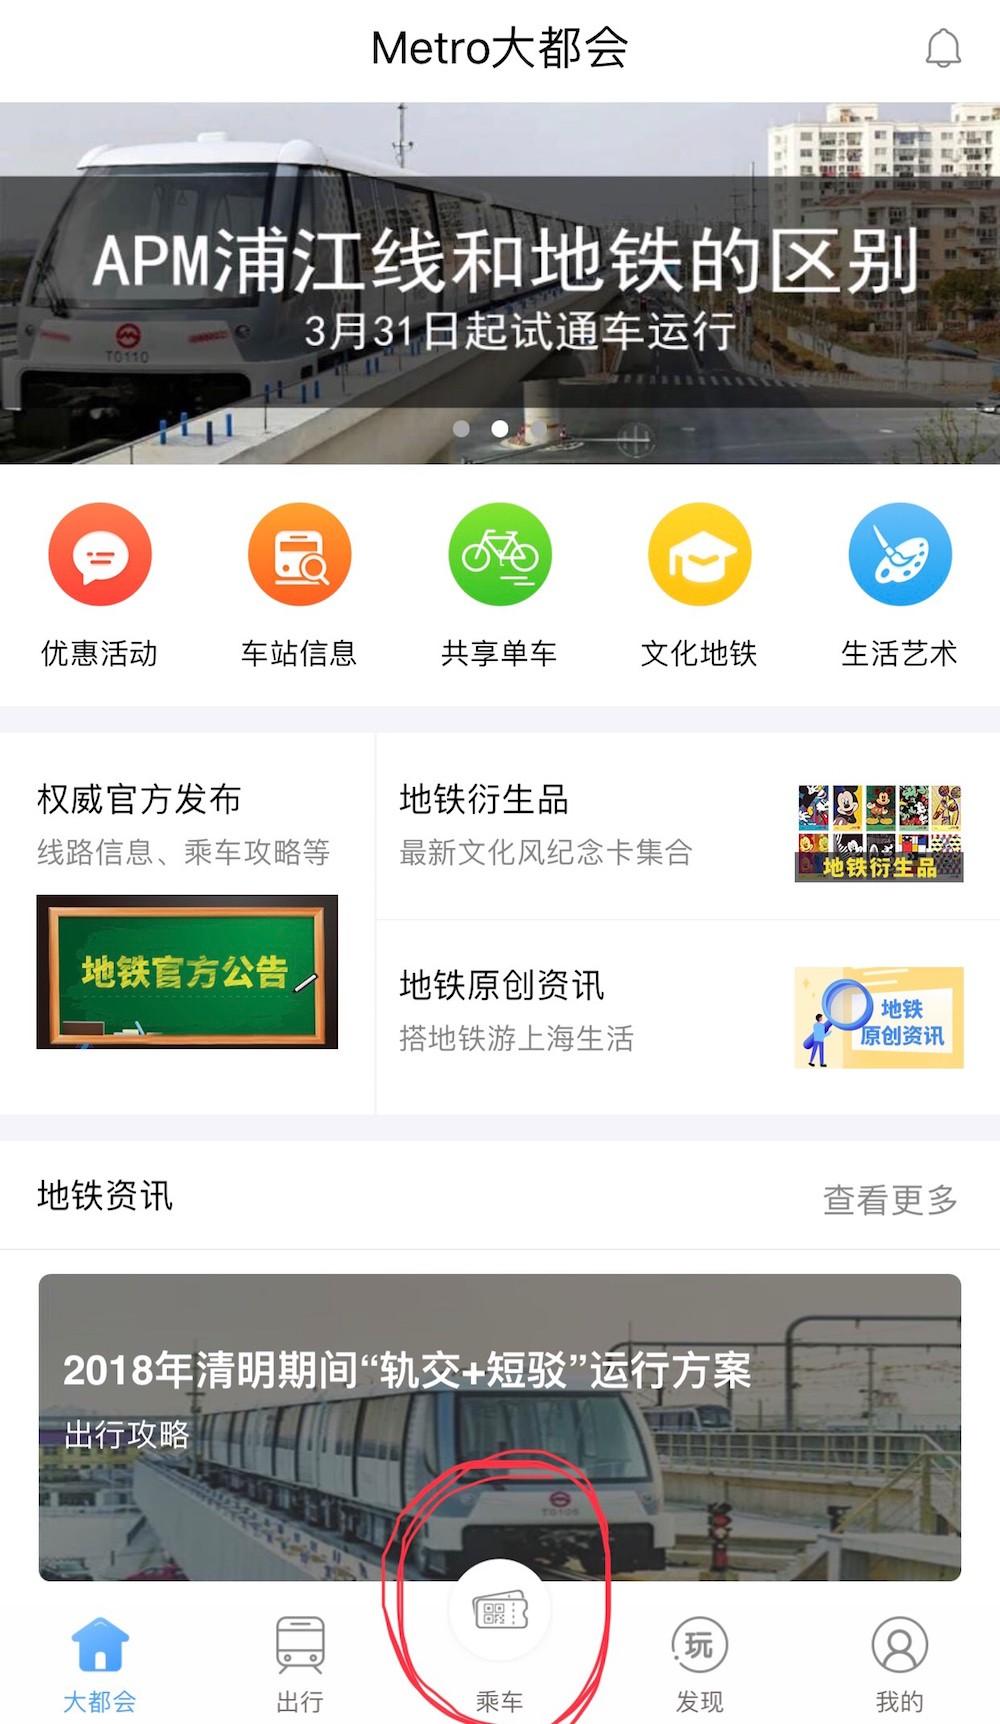 Metro App Foreigners